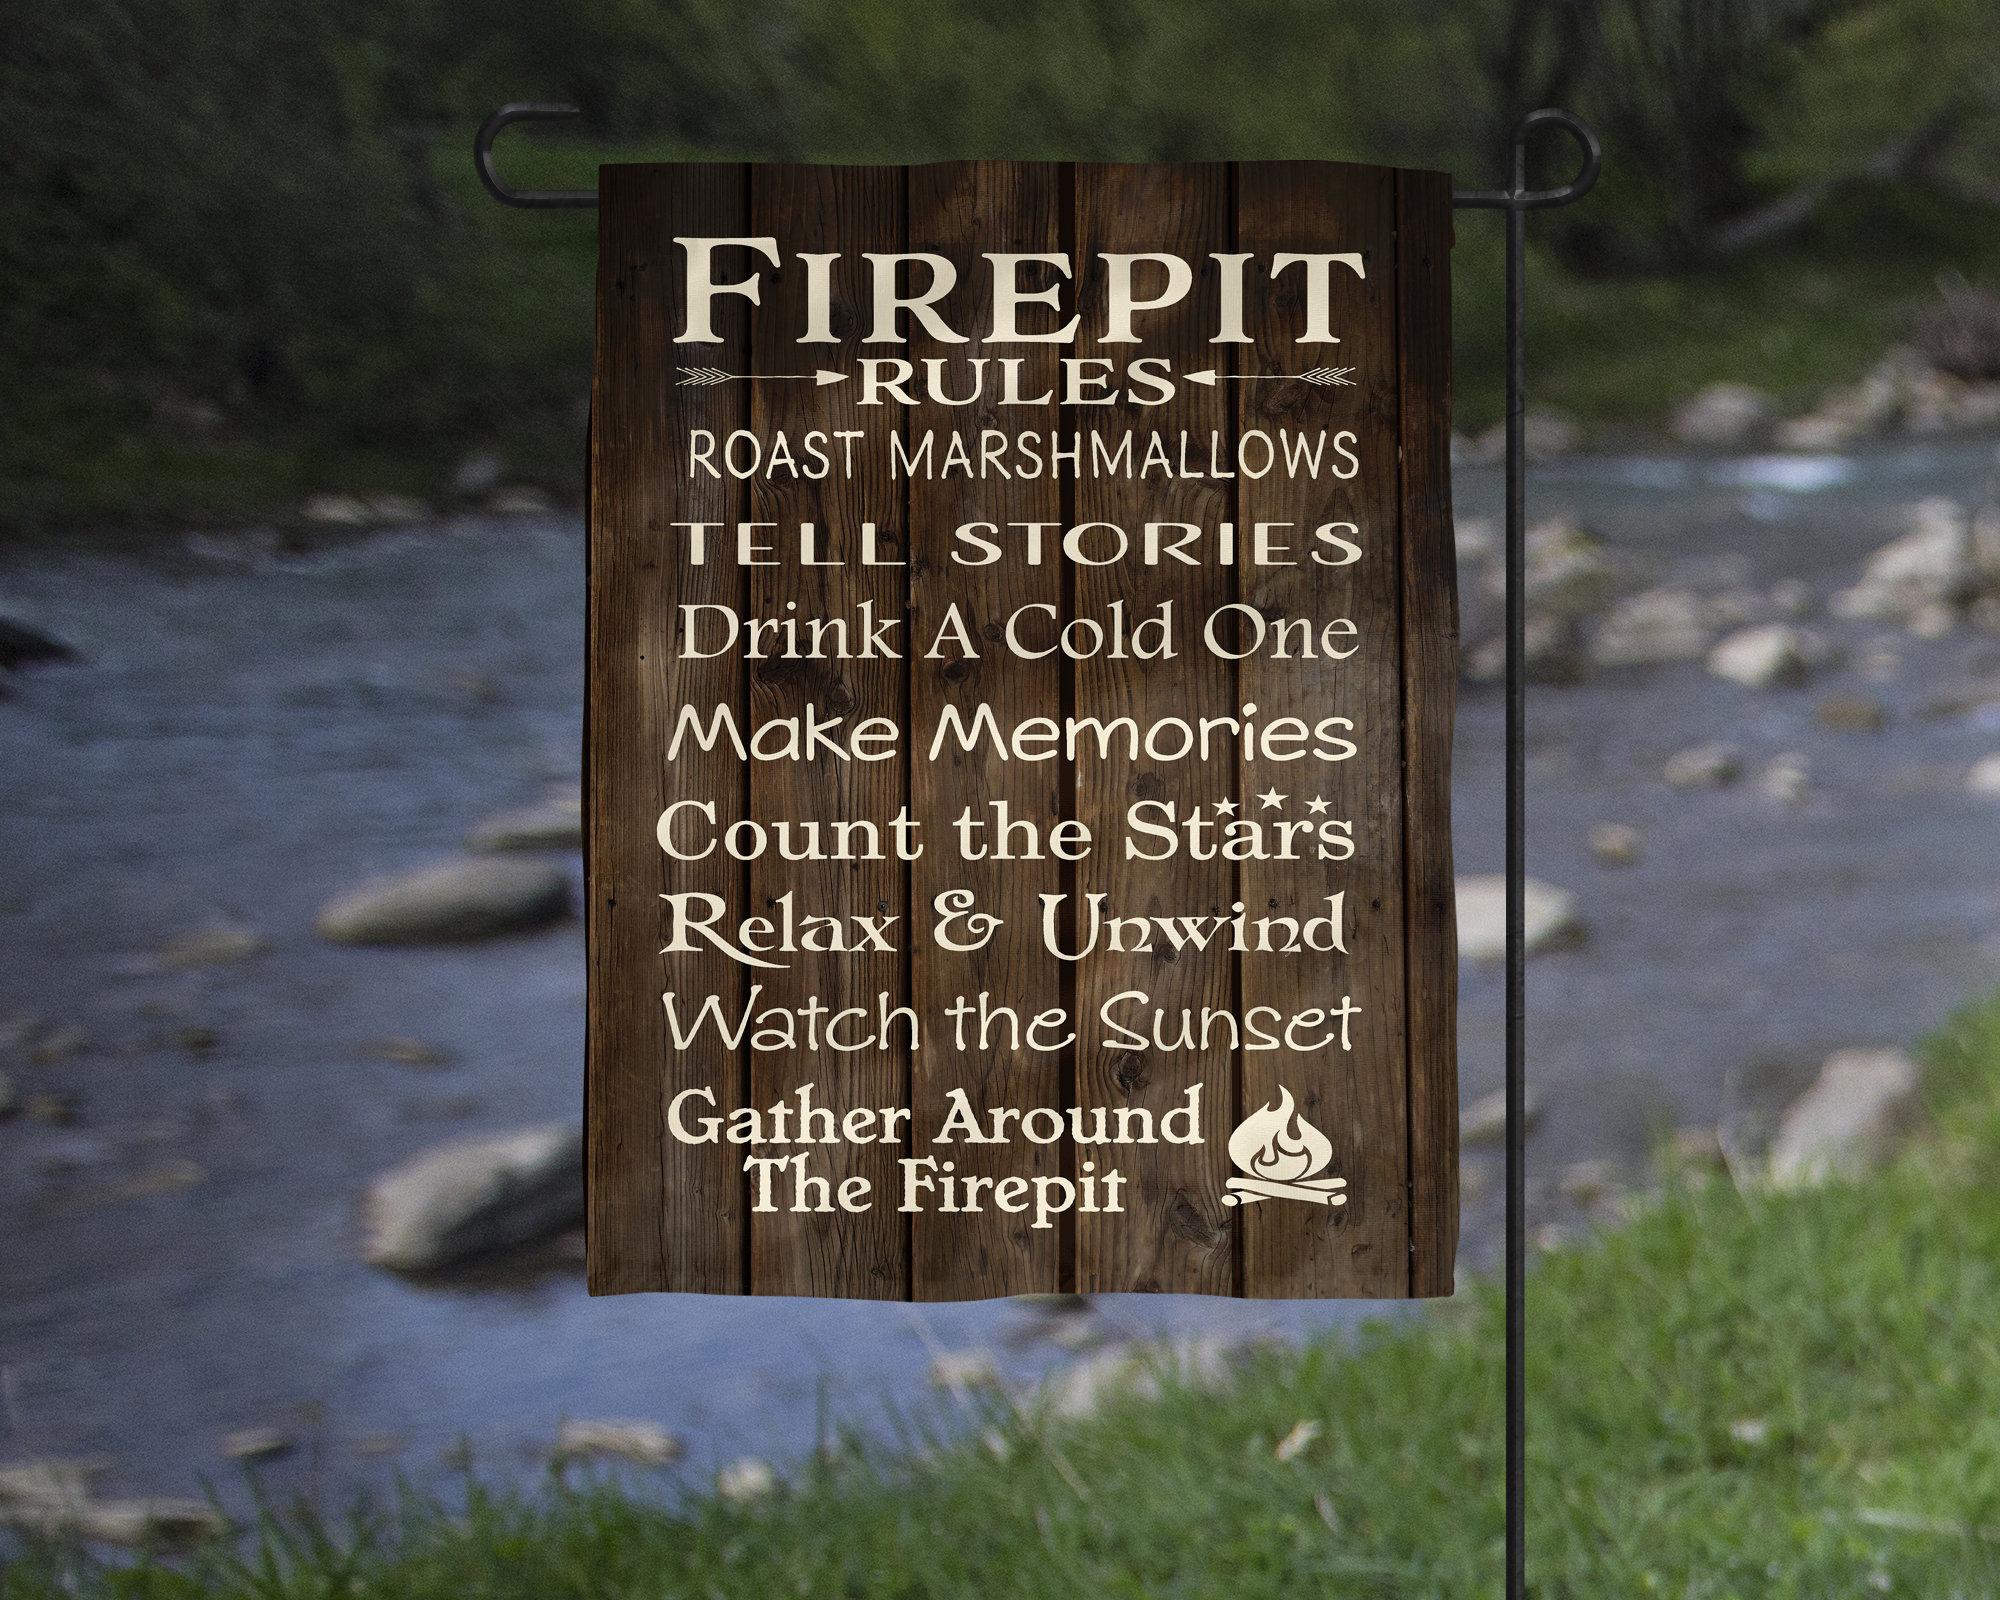 Firepit Rules Garden Flag - Cabin, Backyard Decor Christmas Gift ...